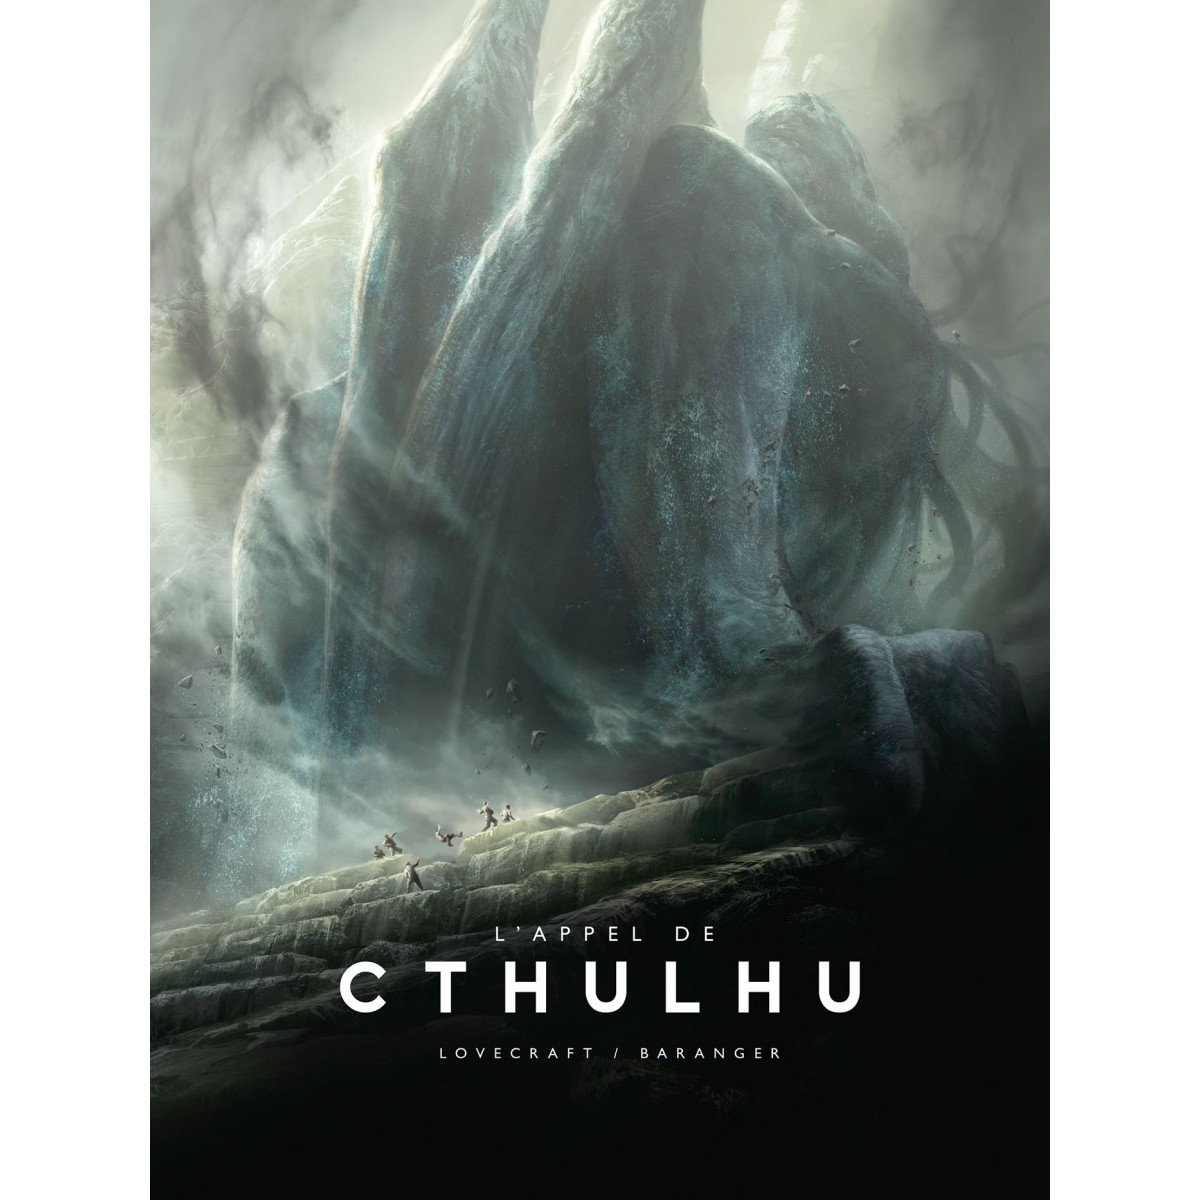 H.P. Lovecraft & François Baranger - L'appel de Cthulhu